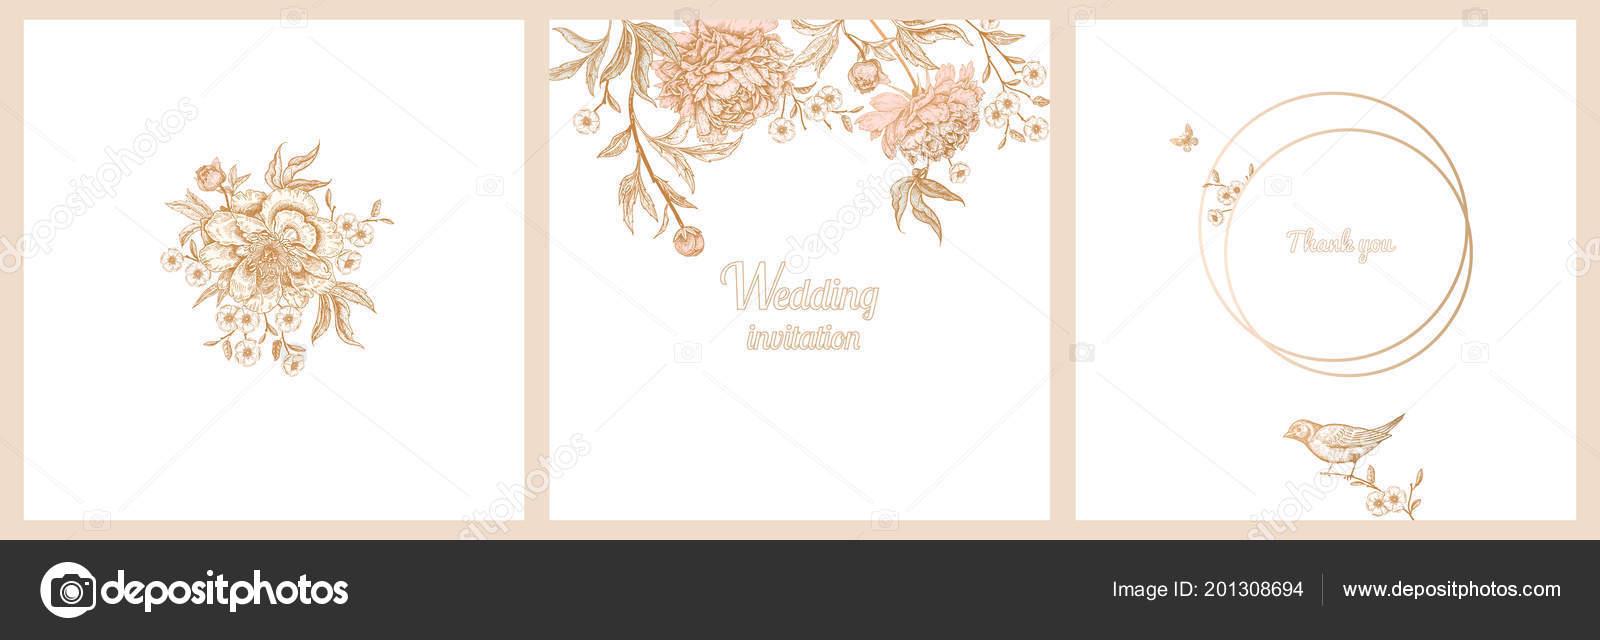 templates wedding invitations set decoration birds garden flowers